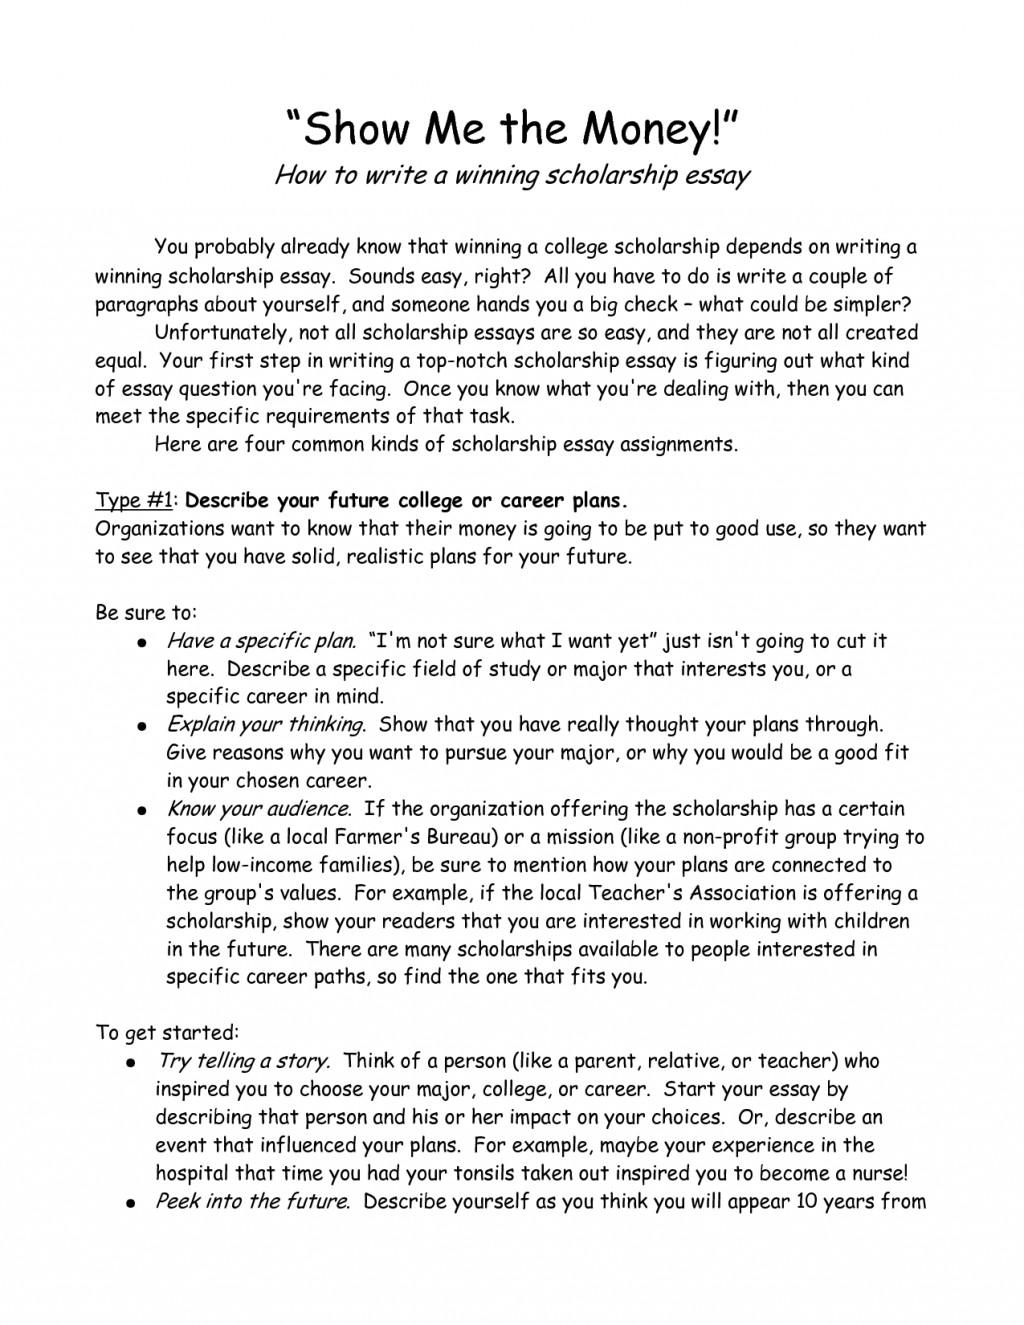 009 Write Essays For Money Professional Scholarship Essay Writing Website College Best University High School Reddit Large